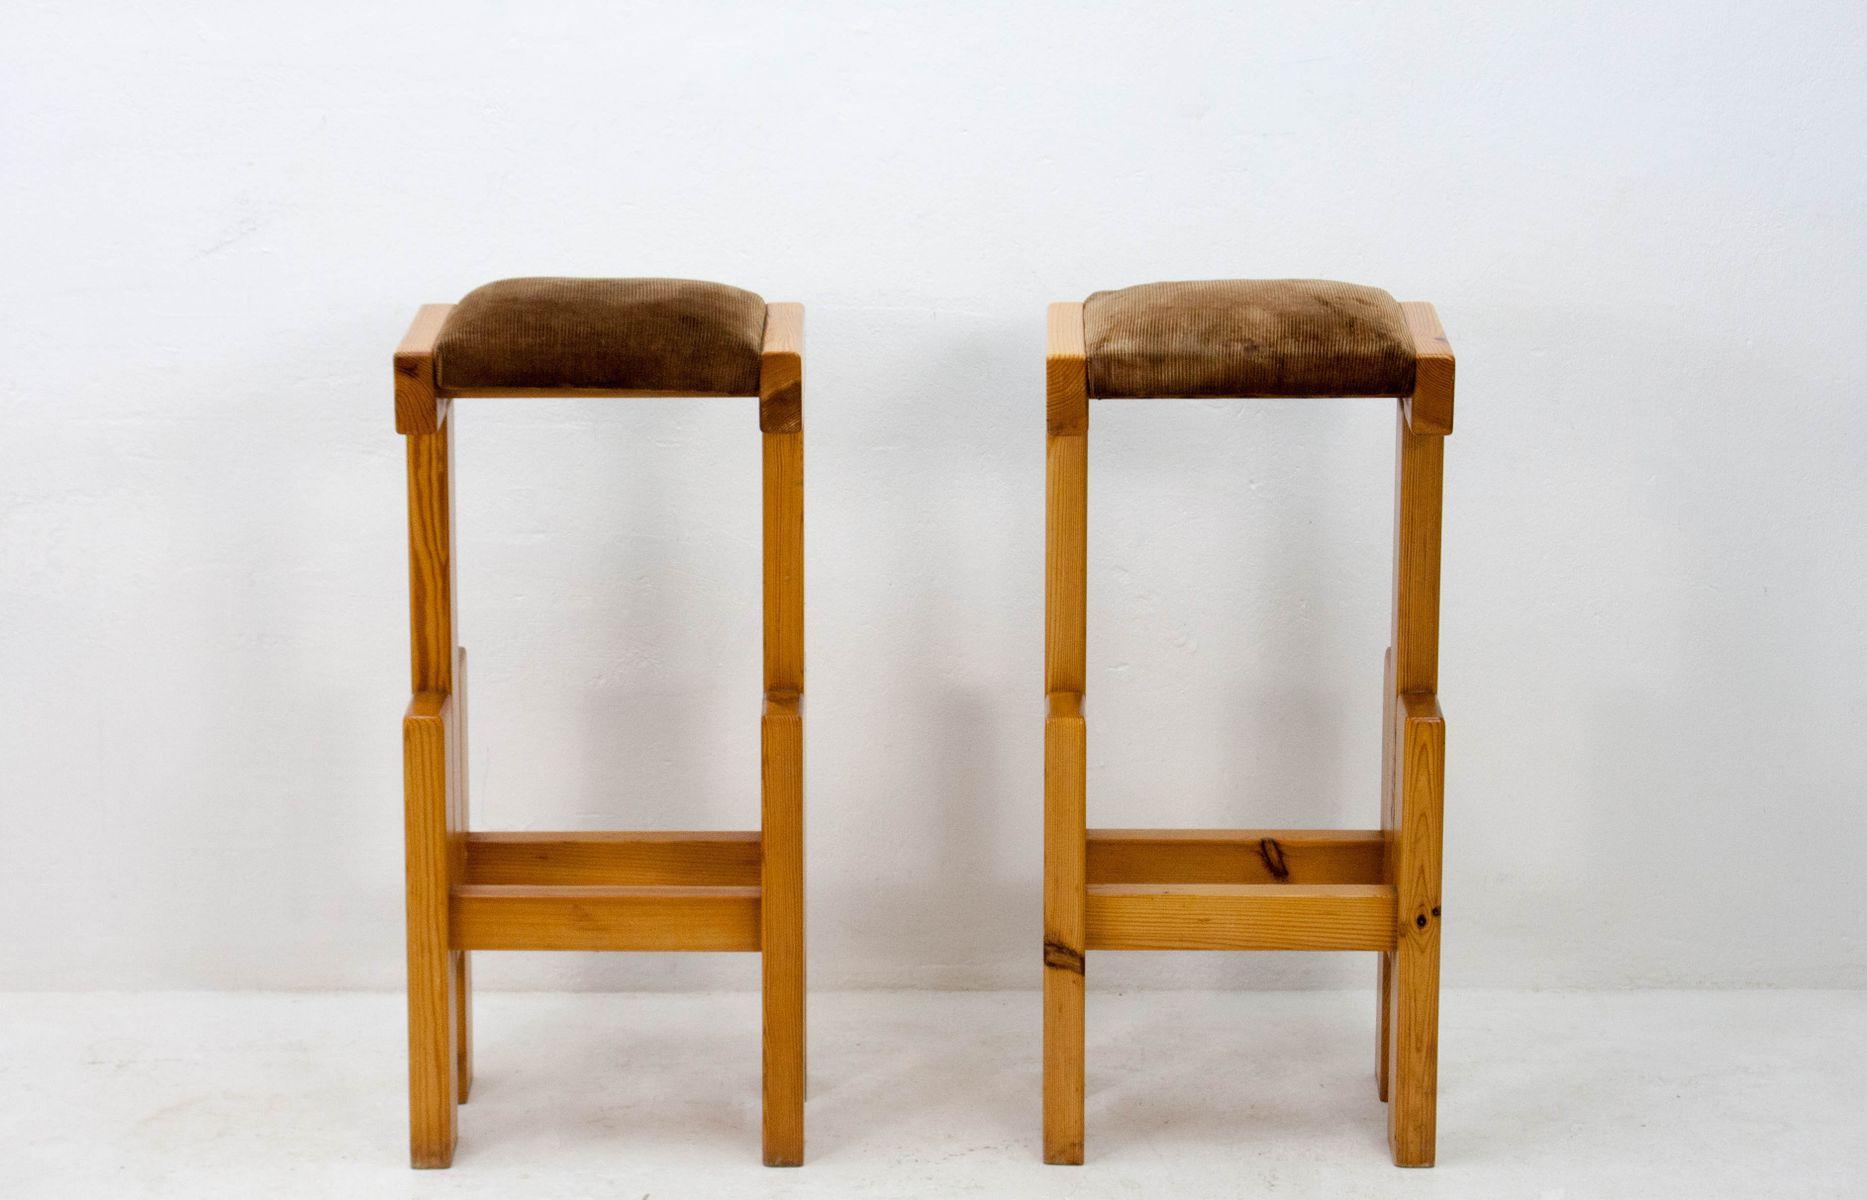 Amazing Vintage Sthle Aus Pinienholz Im Sil Er Set With Pinienholz Kaufen